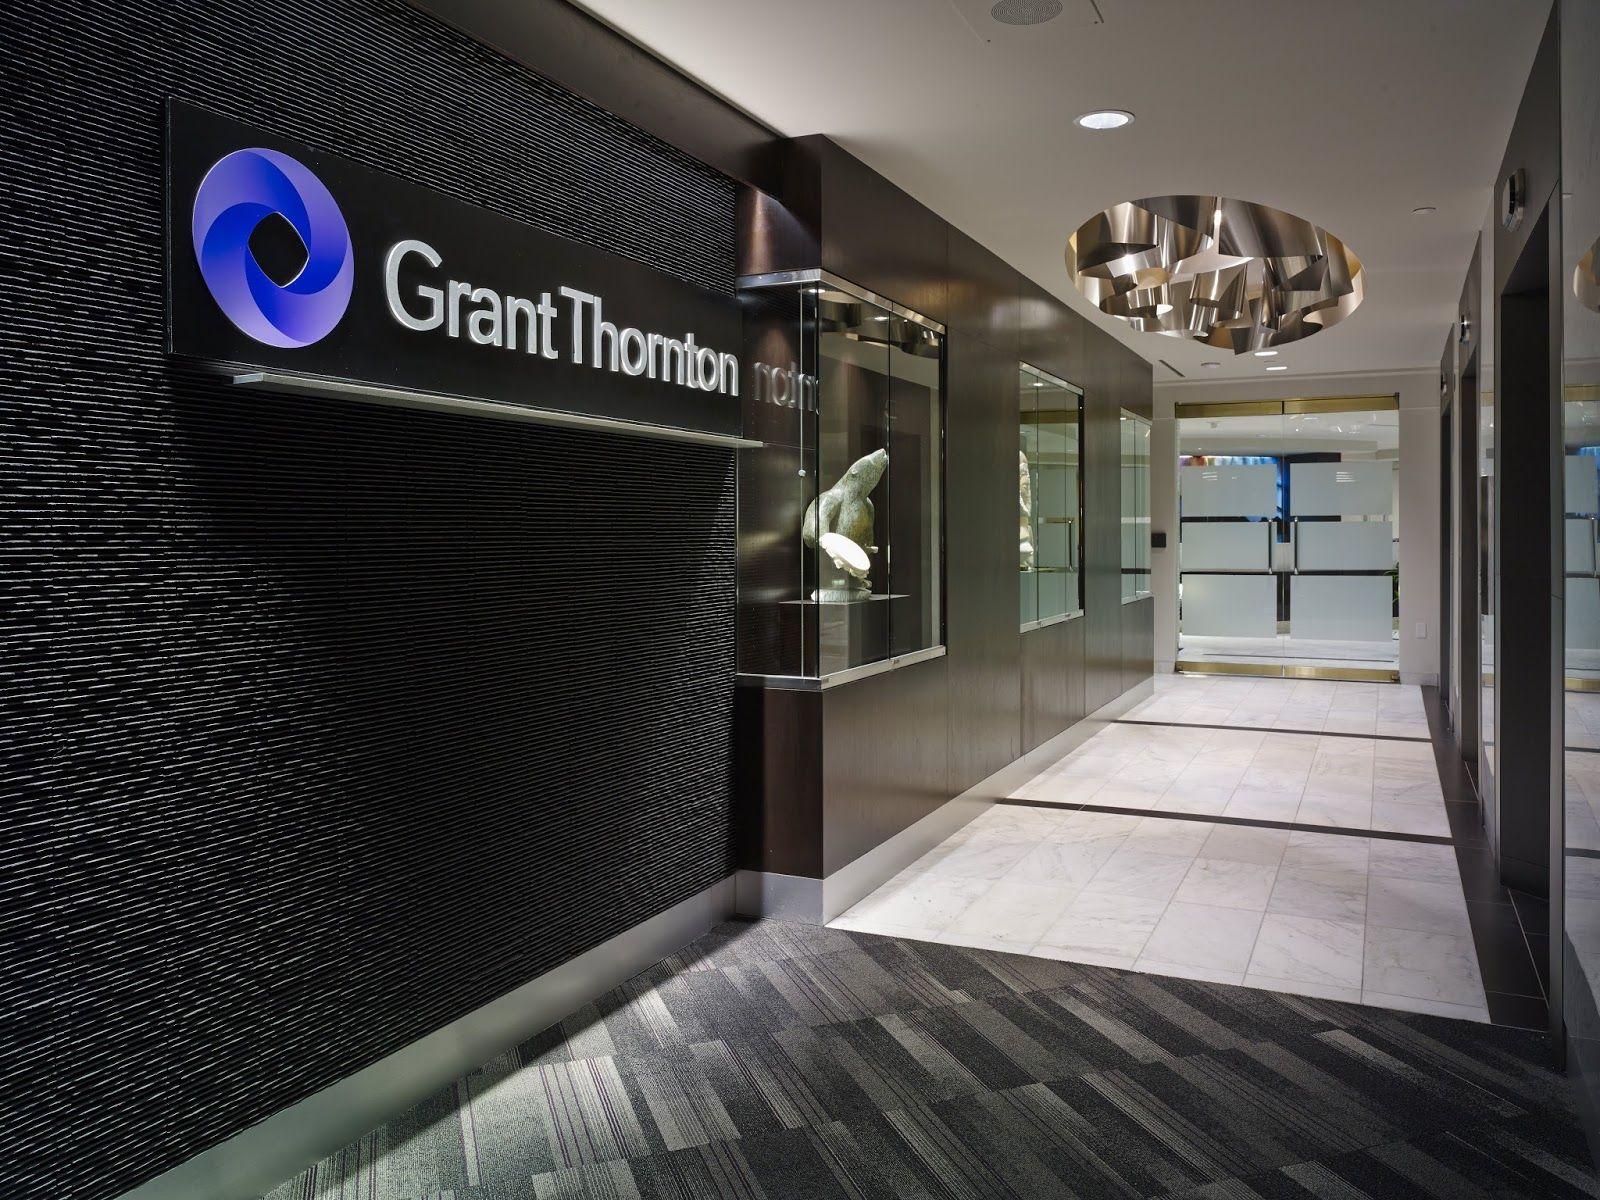 grant thorton interior office design modern office architecture interior design community. Black Bedroom Furniture Sets. Home Design Ideas